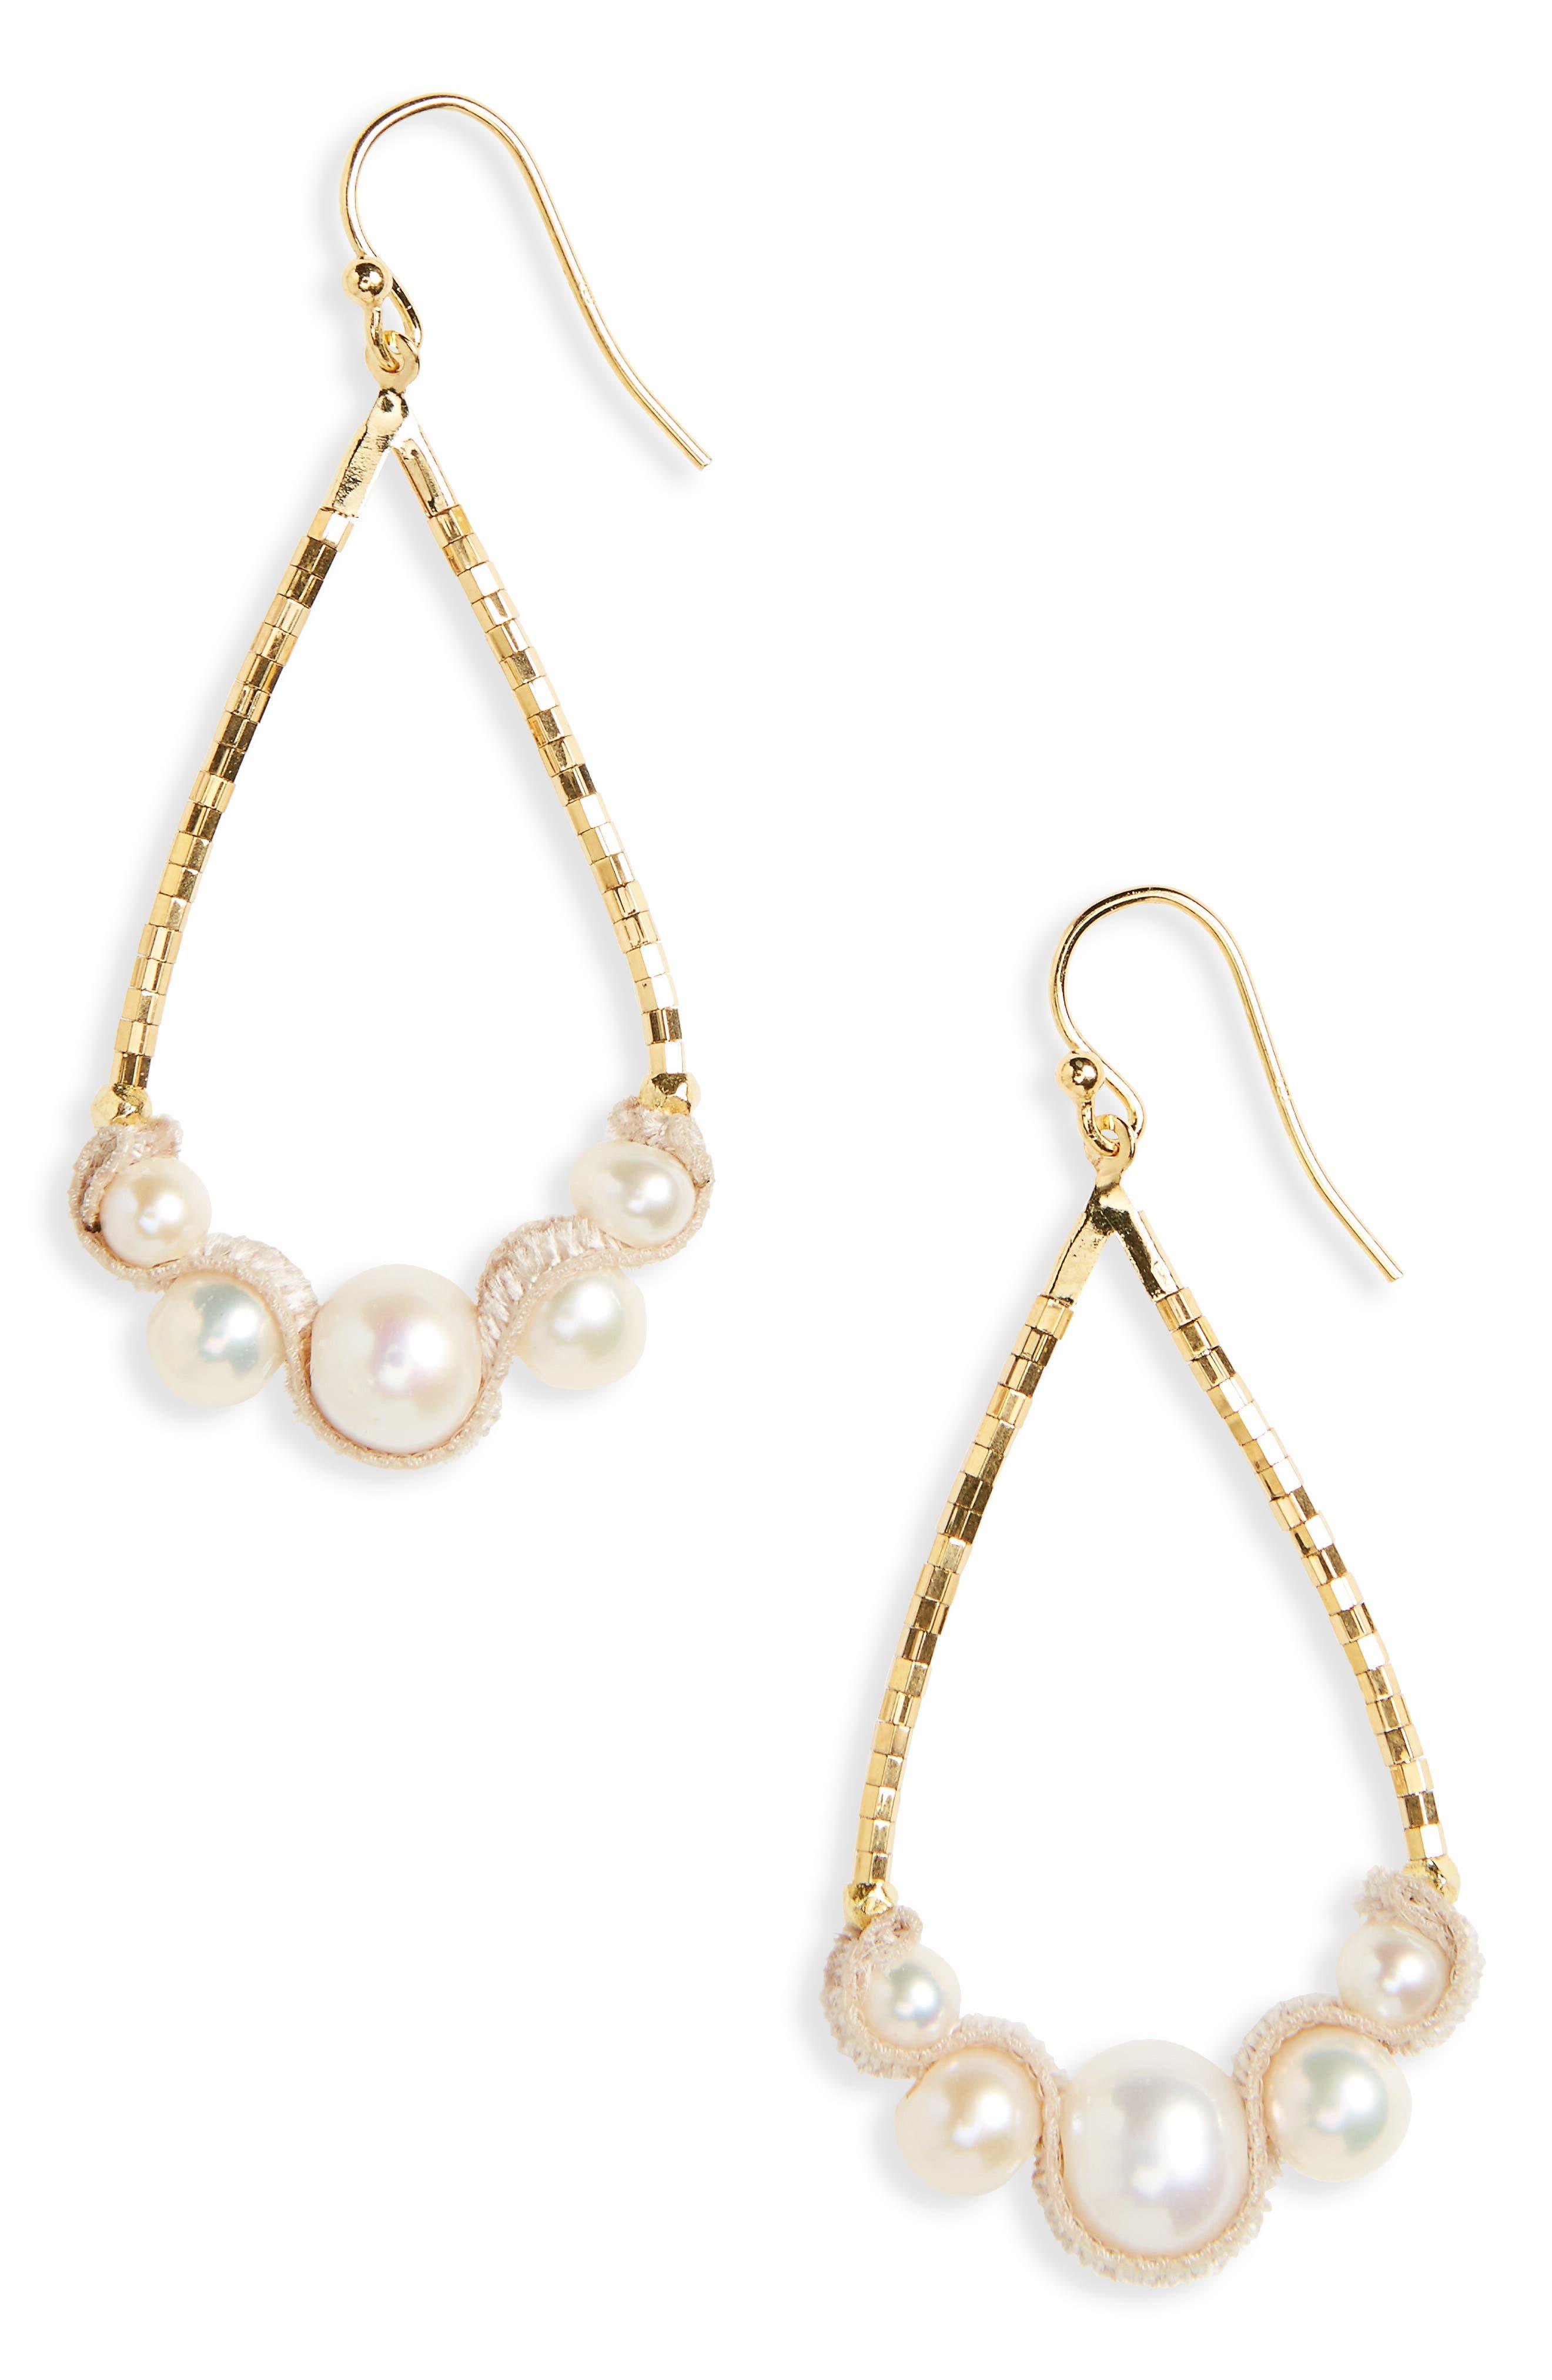 Pearl & Velvet Drop Earrings,                             Main thumbnail 1, color,                             710